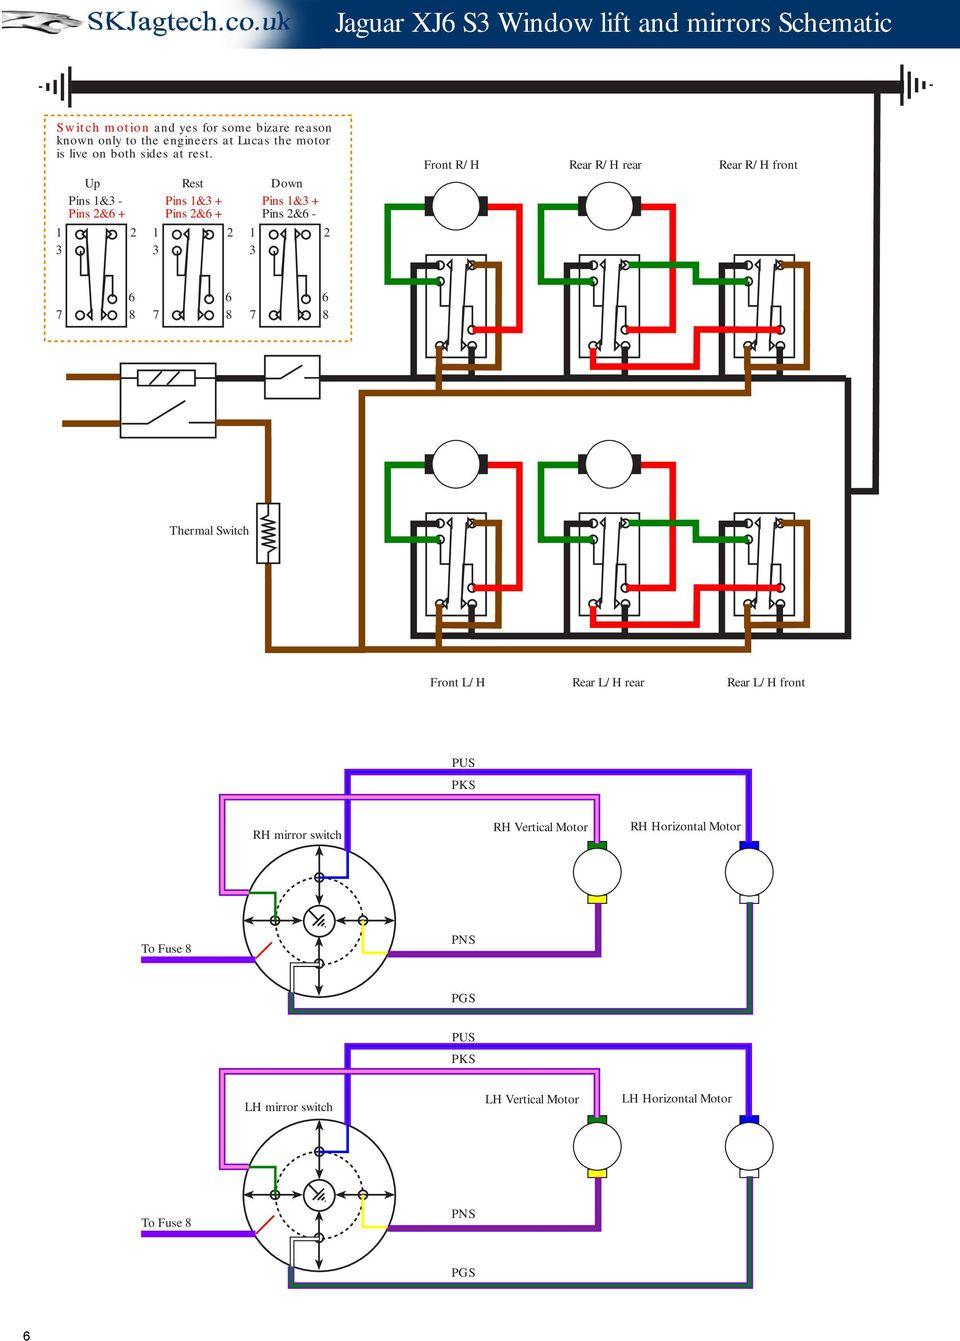 medium resolution of jaguar xj6 series 3 schematic drawings pdf jaguar xj6 series 3 wiring diagram